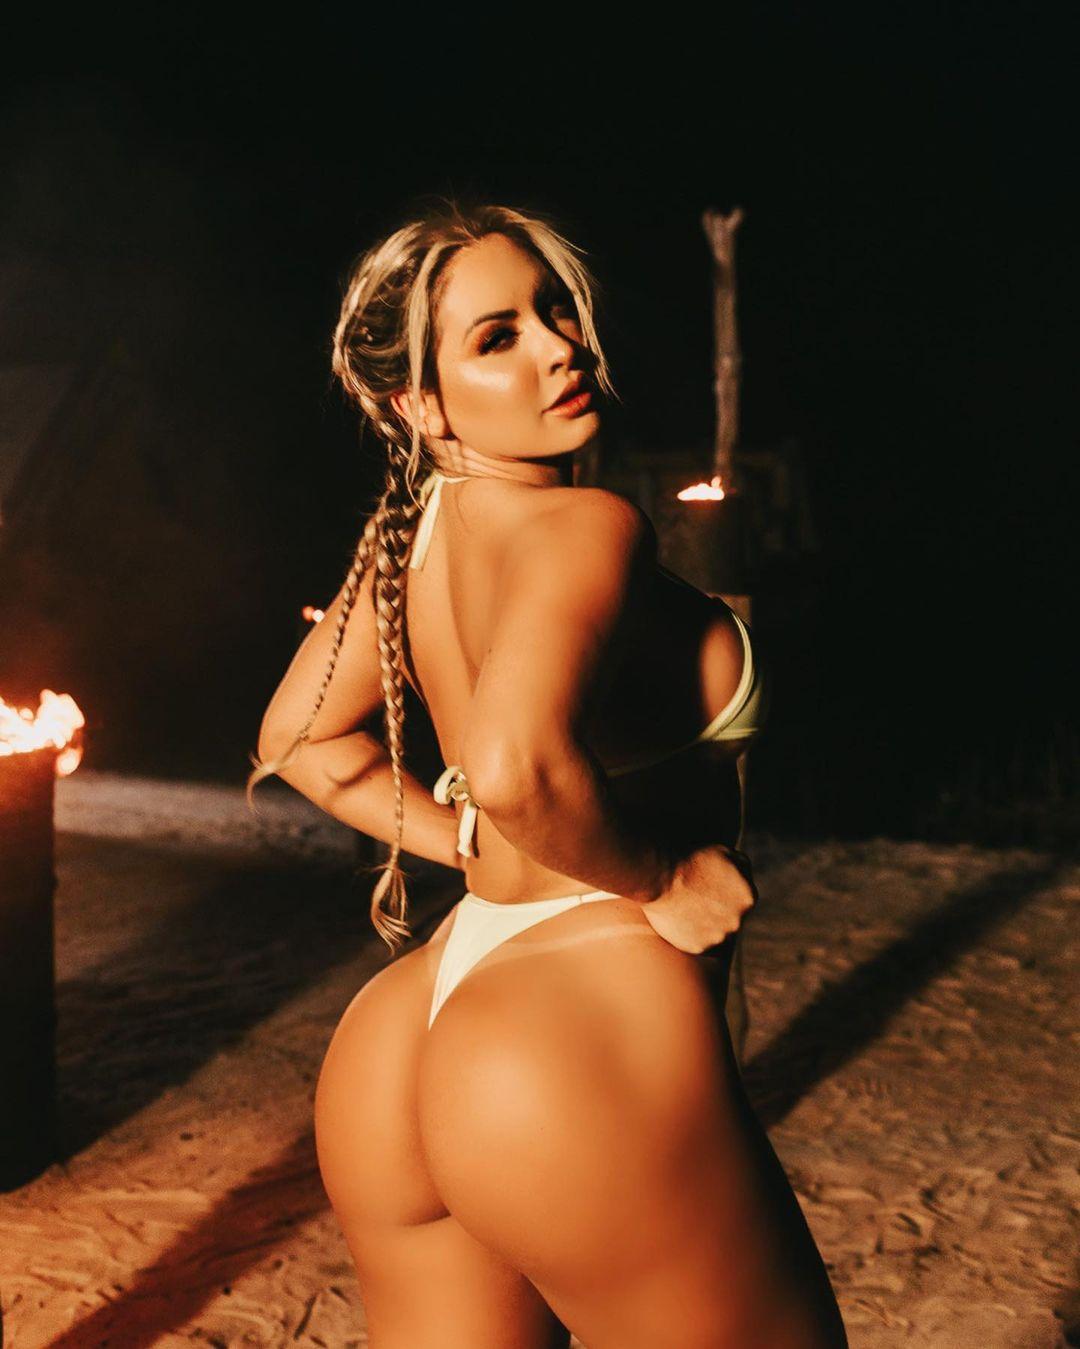 Iara Ferreira é Top 5 do OnlyFans